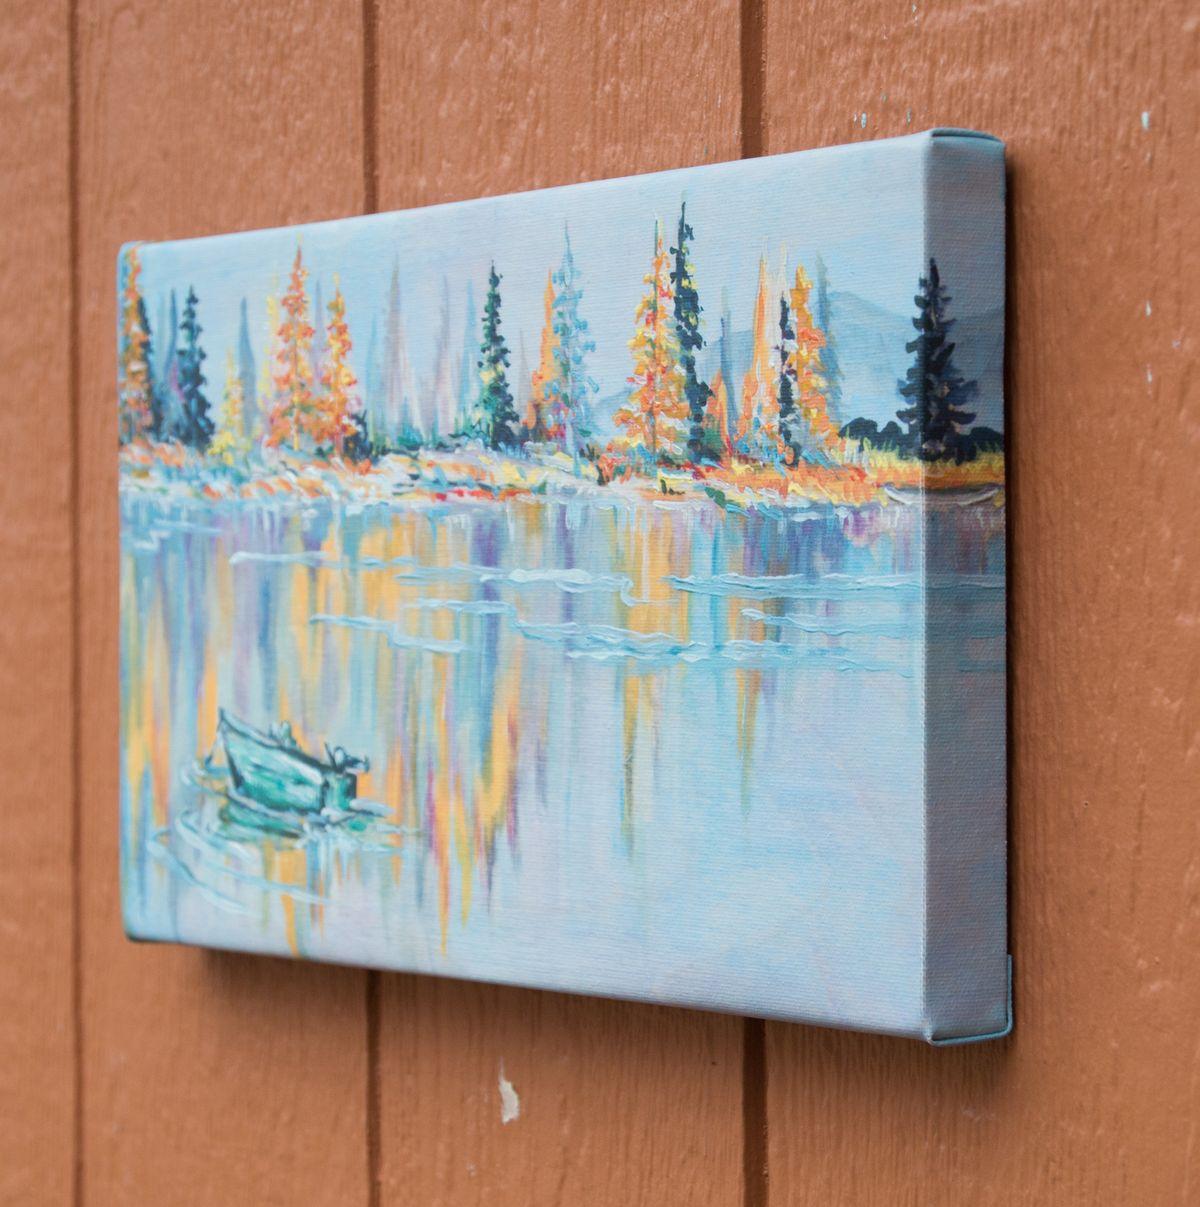 Professional Mirror Image Gallery Wrap Canvas